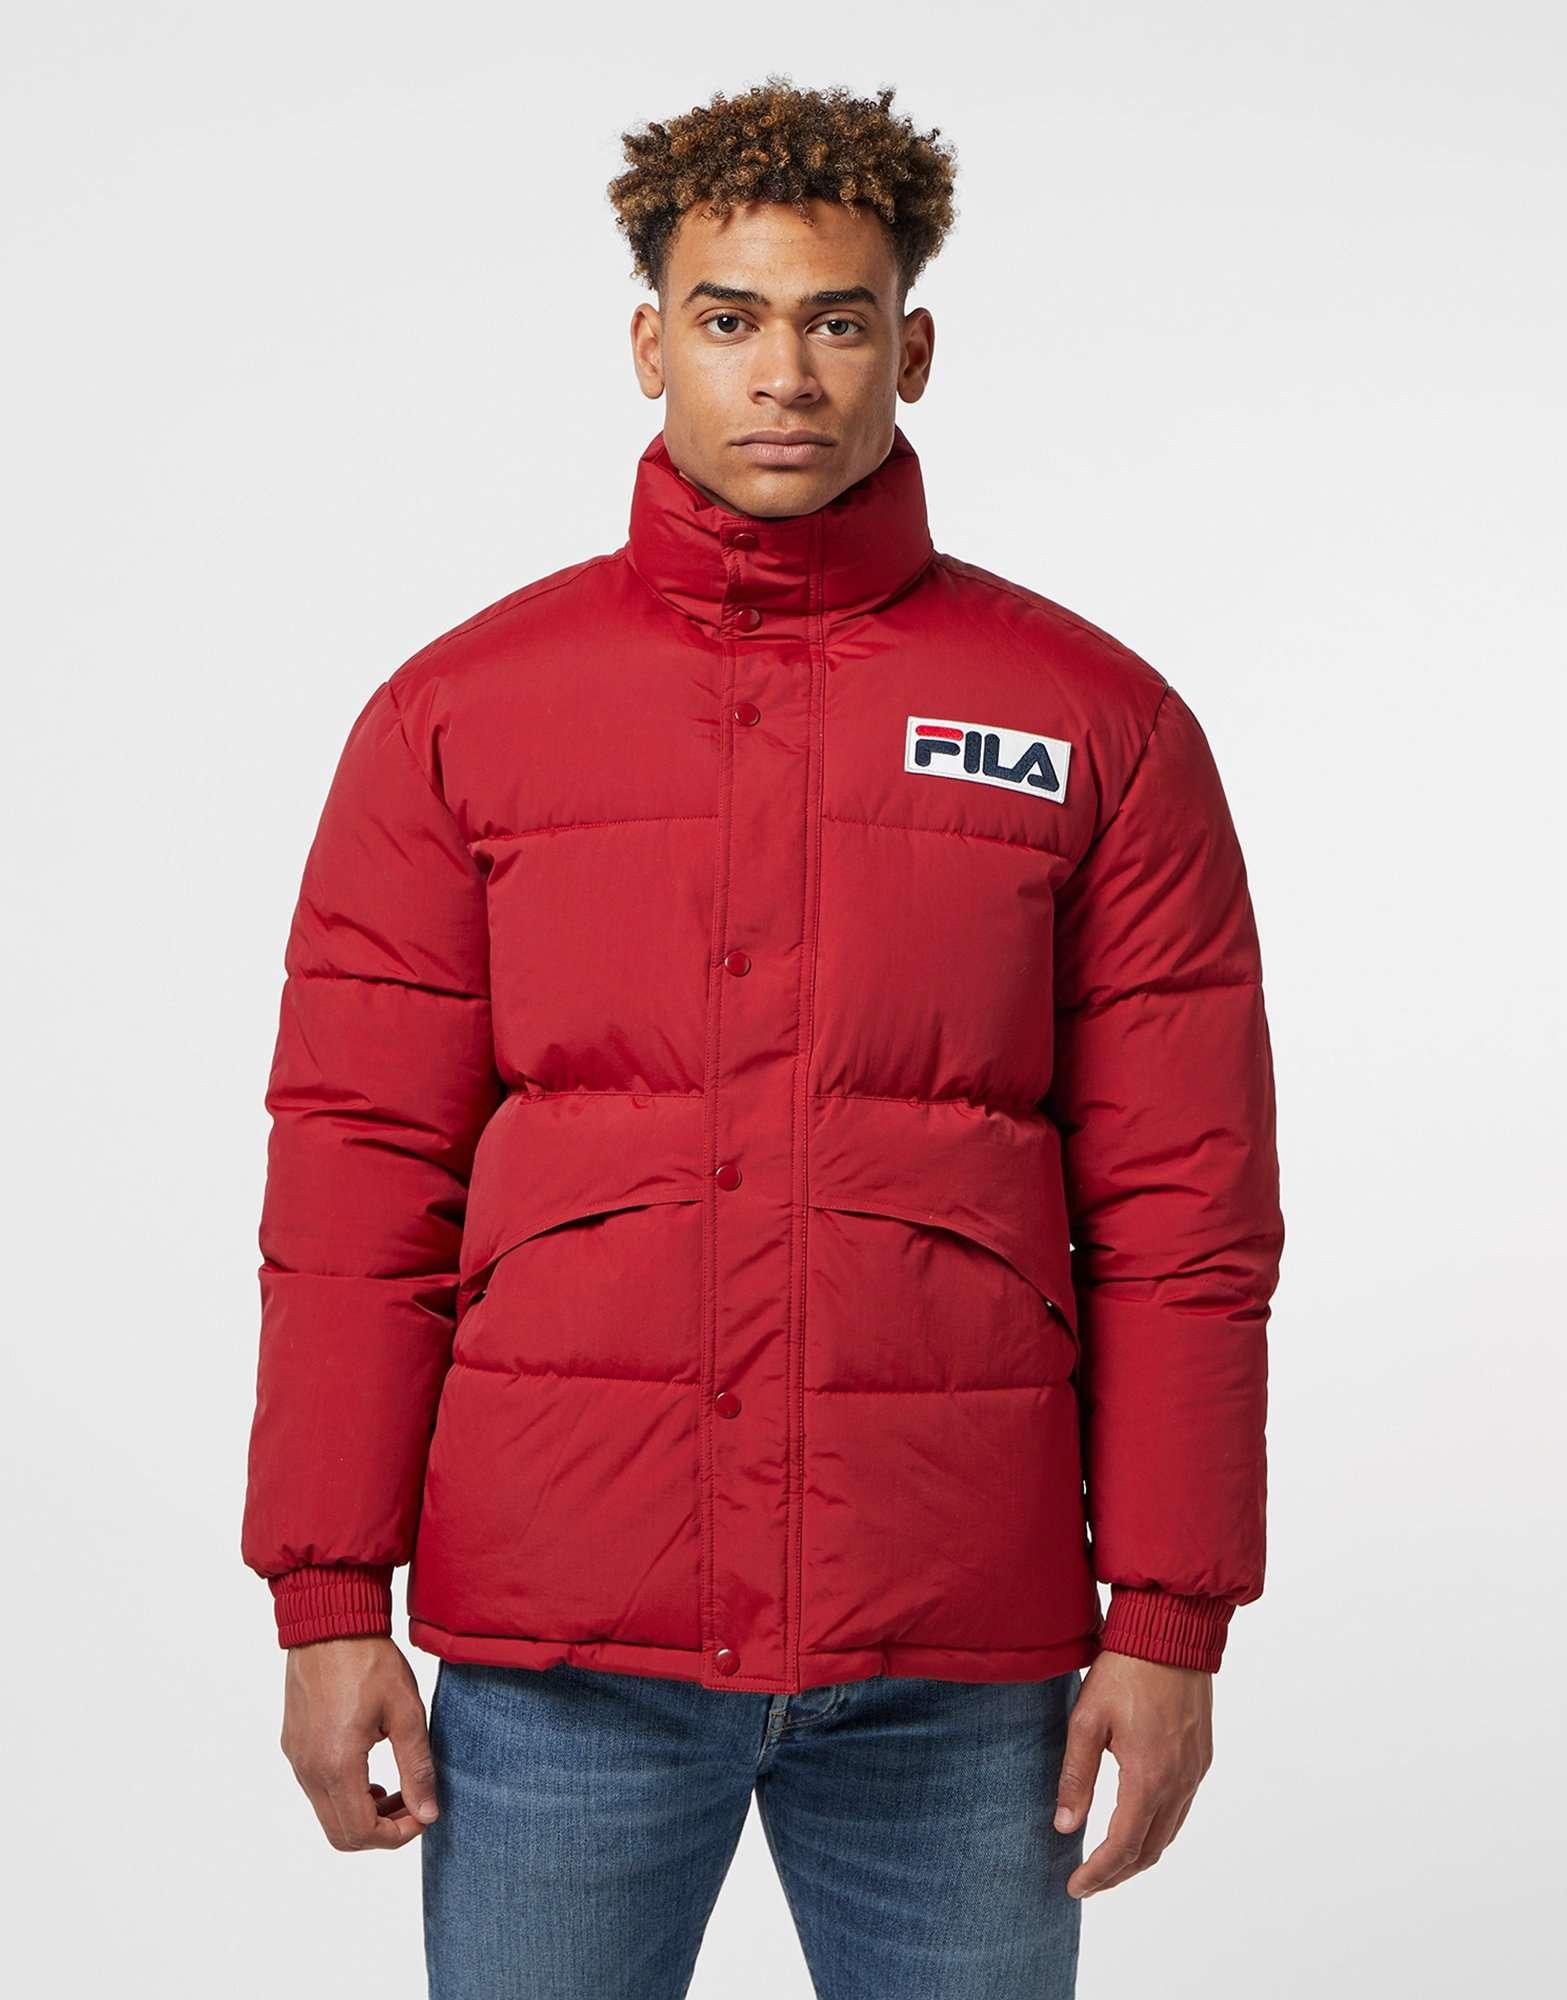 Fila Nanga Jacket